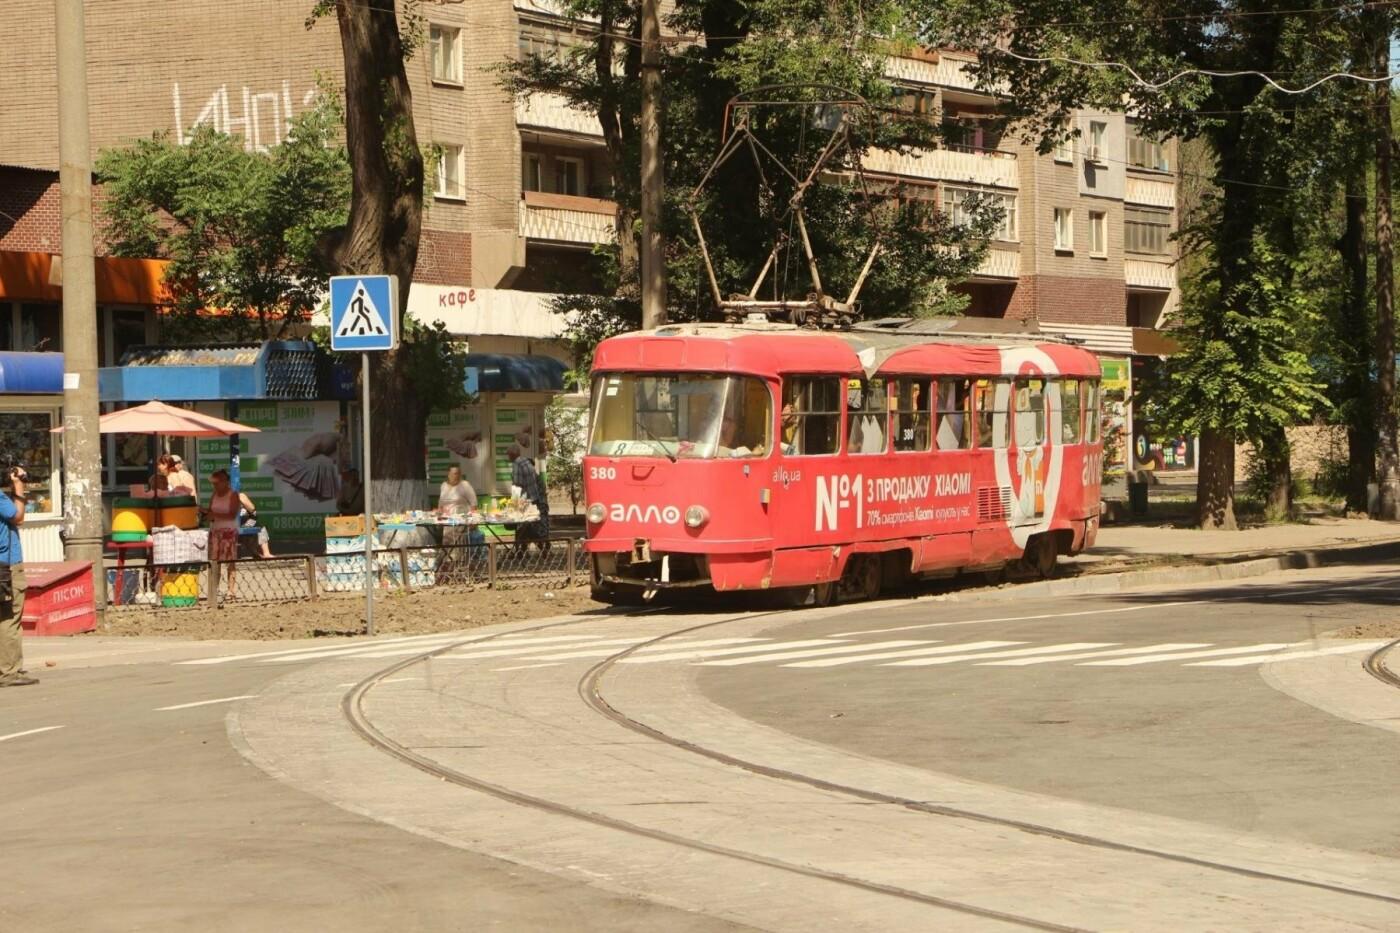 В Запорожье заканчивают ремонт-долгострой трамвайного пути на Кичкасе, – ФОТО, фото-4